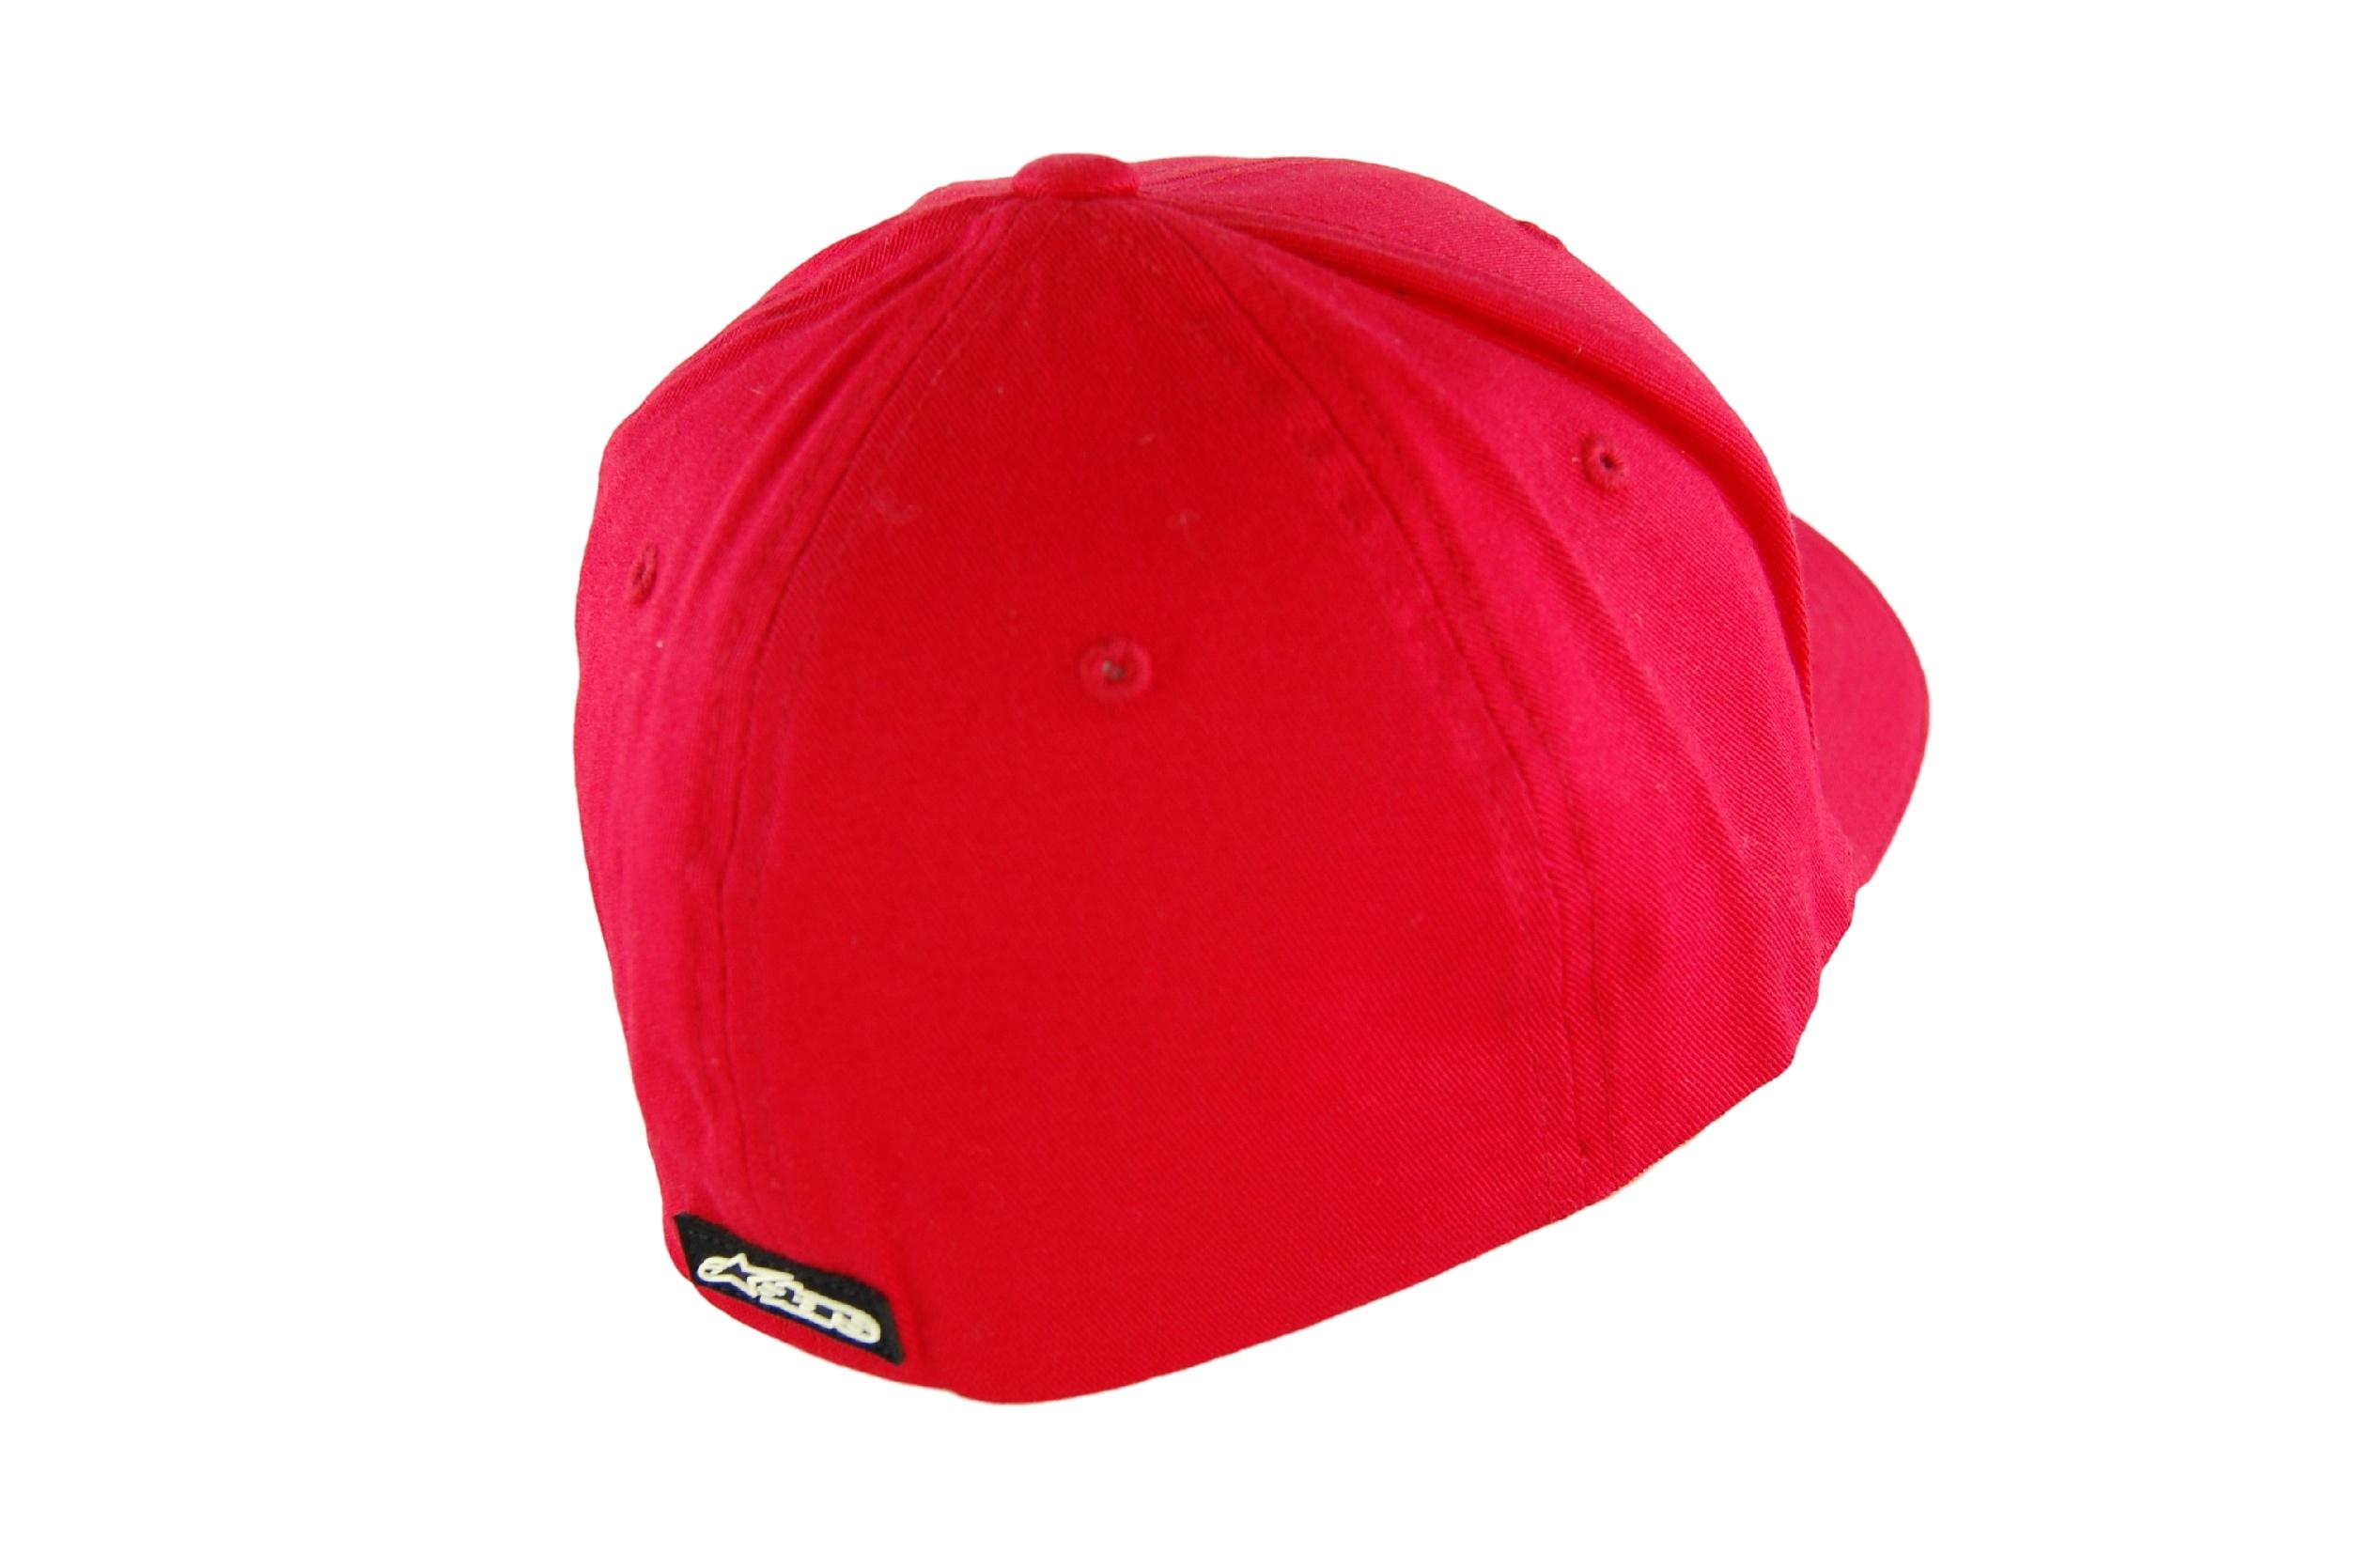 New-Alpinestars-Mens-BUFFALO-WREATH-FlexFit-Hat-Motocross-Baseball-Cap-L-XL thumbnail 4